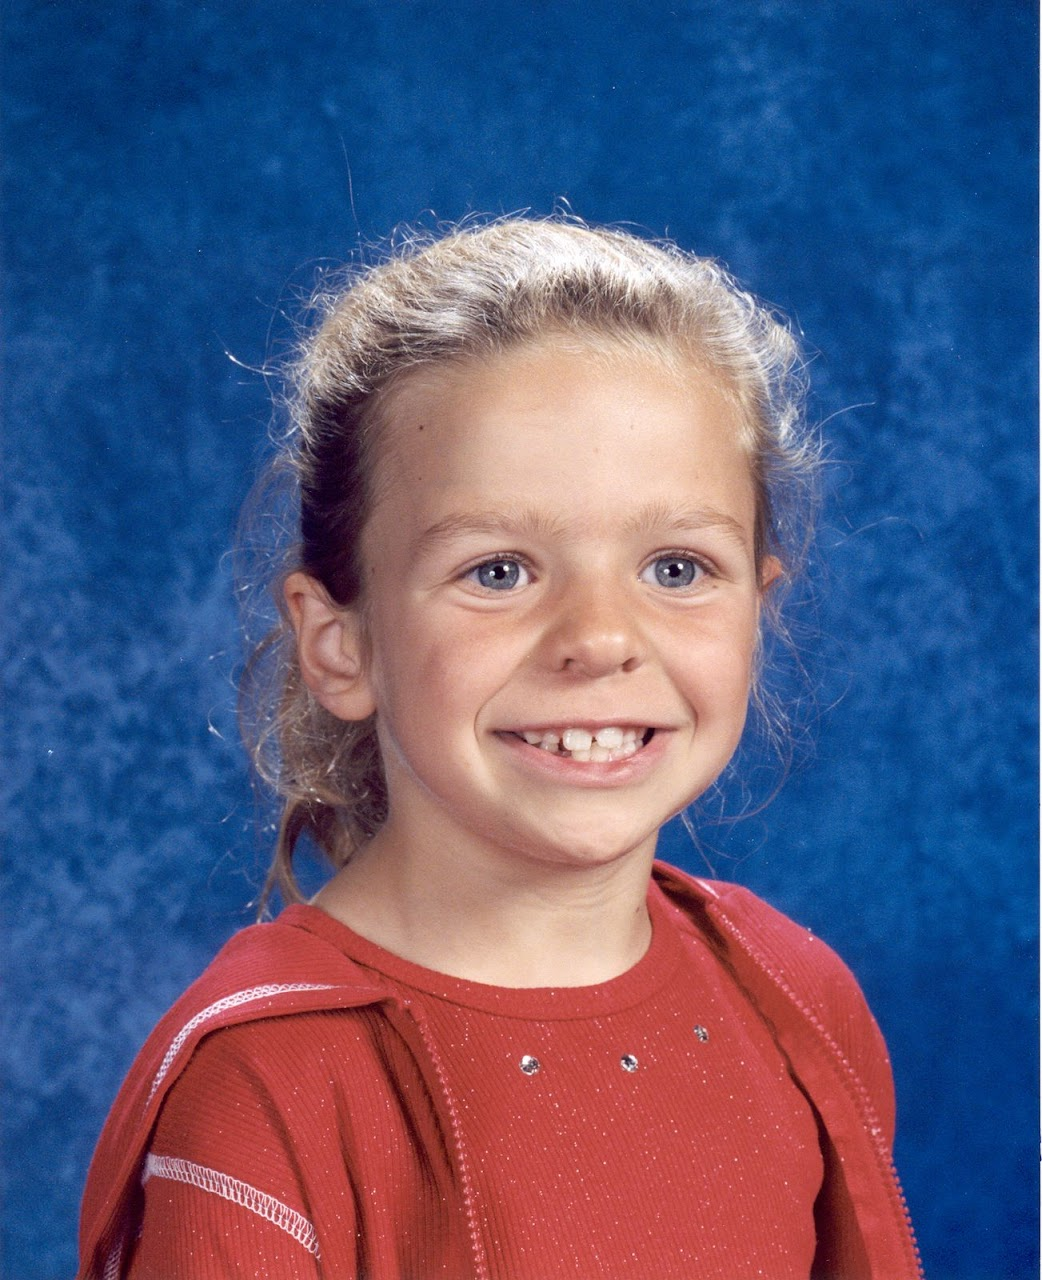 Courtney 1st grade 2002